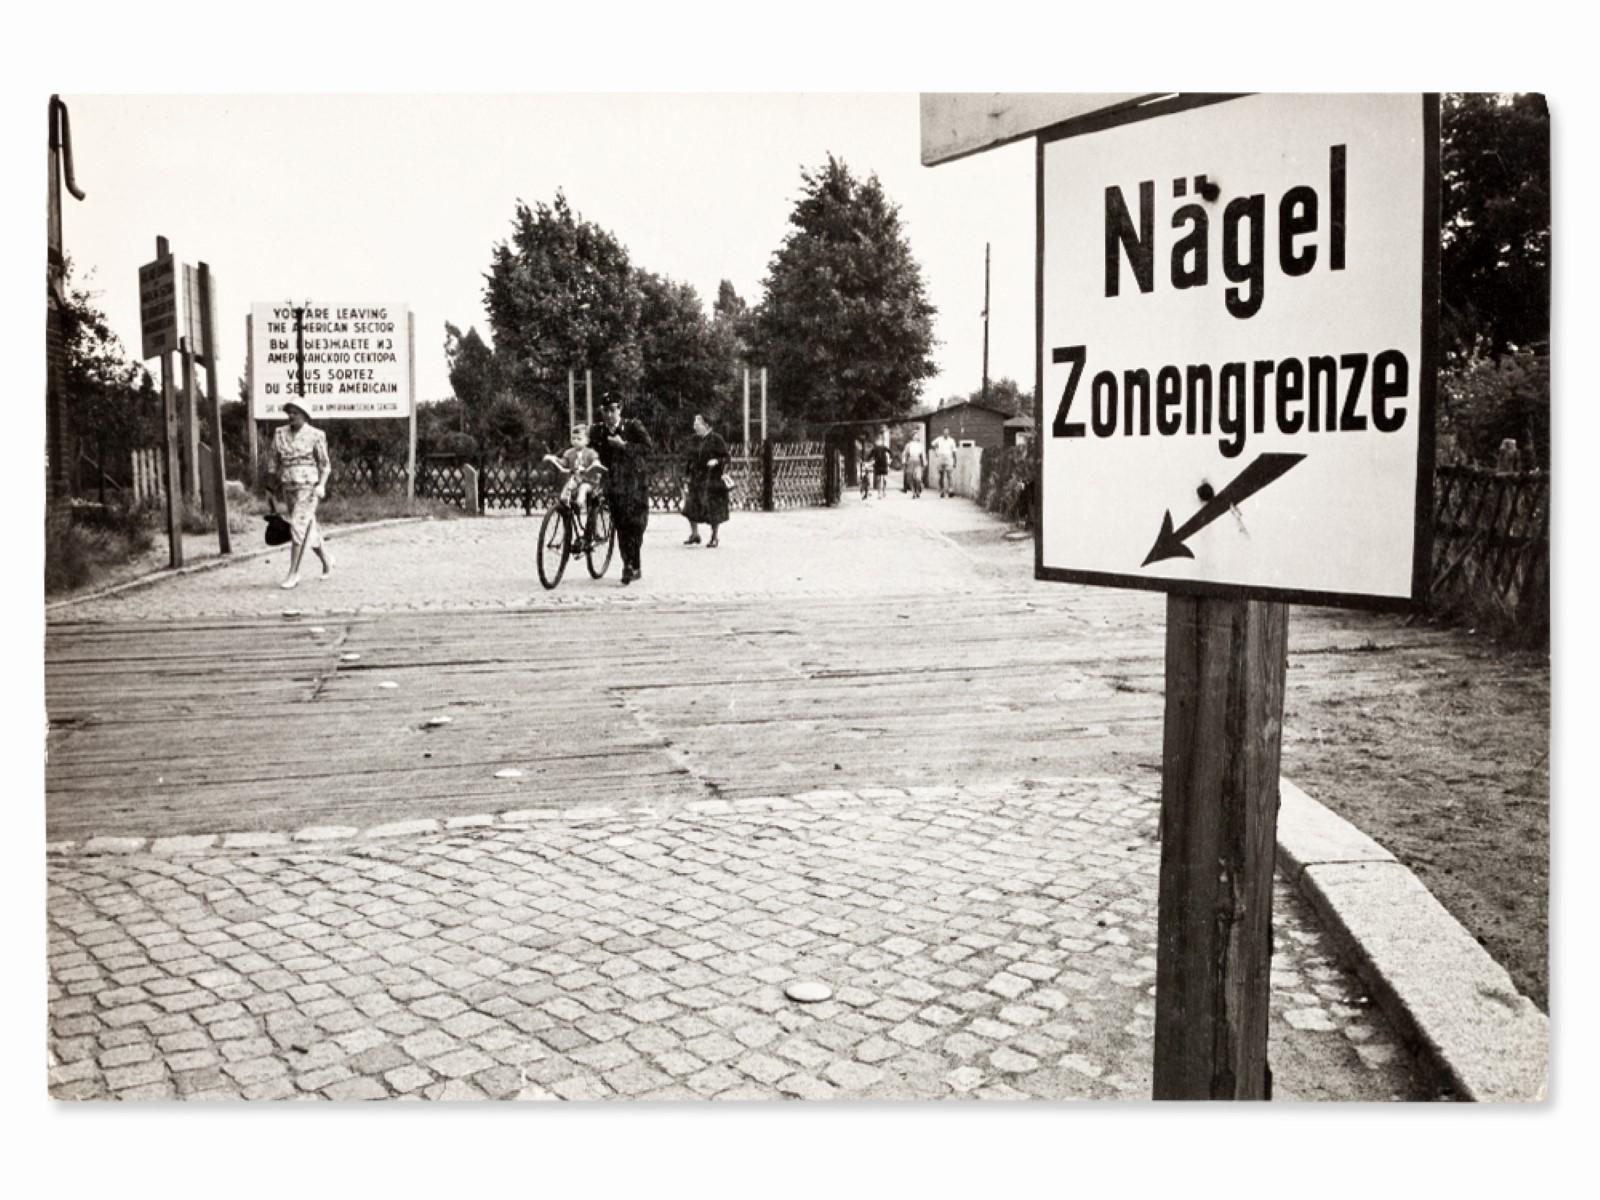 #109 Erich Lessing* (1923-2018), Nails Zone Border, Berlin, 1958 | Erich Lessing* (1923-2018), Nägel Zonengrenze, Berlin, 1958 Image